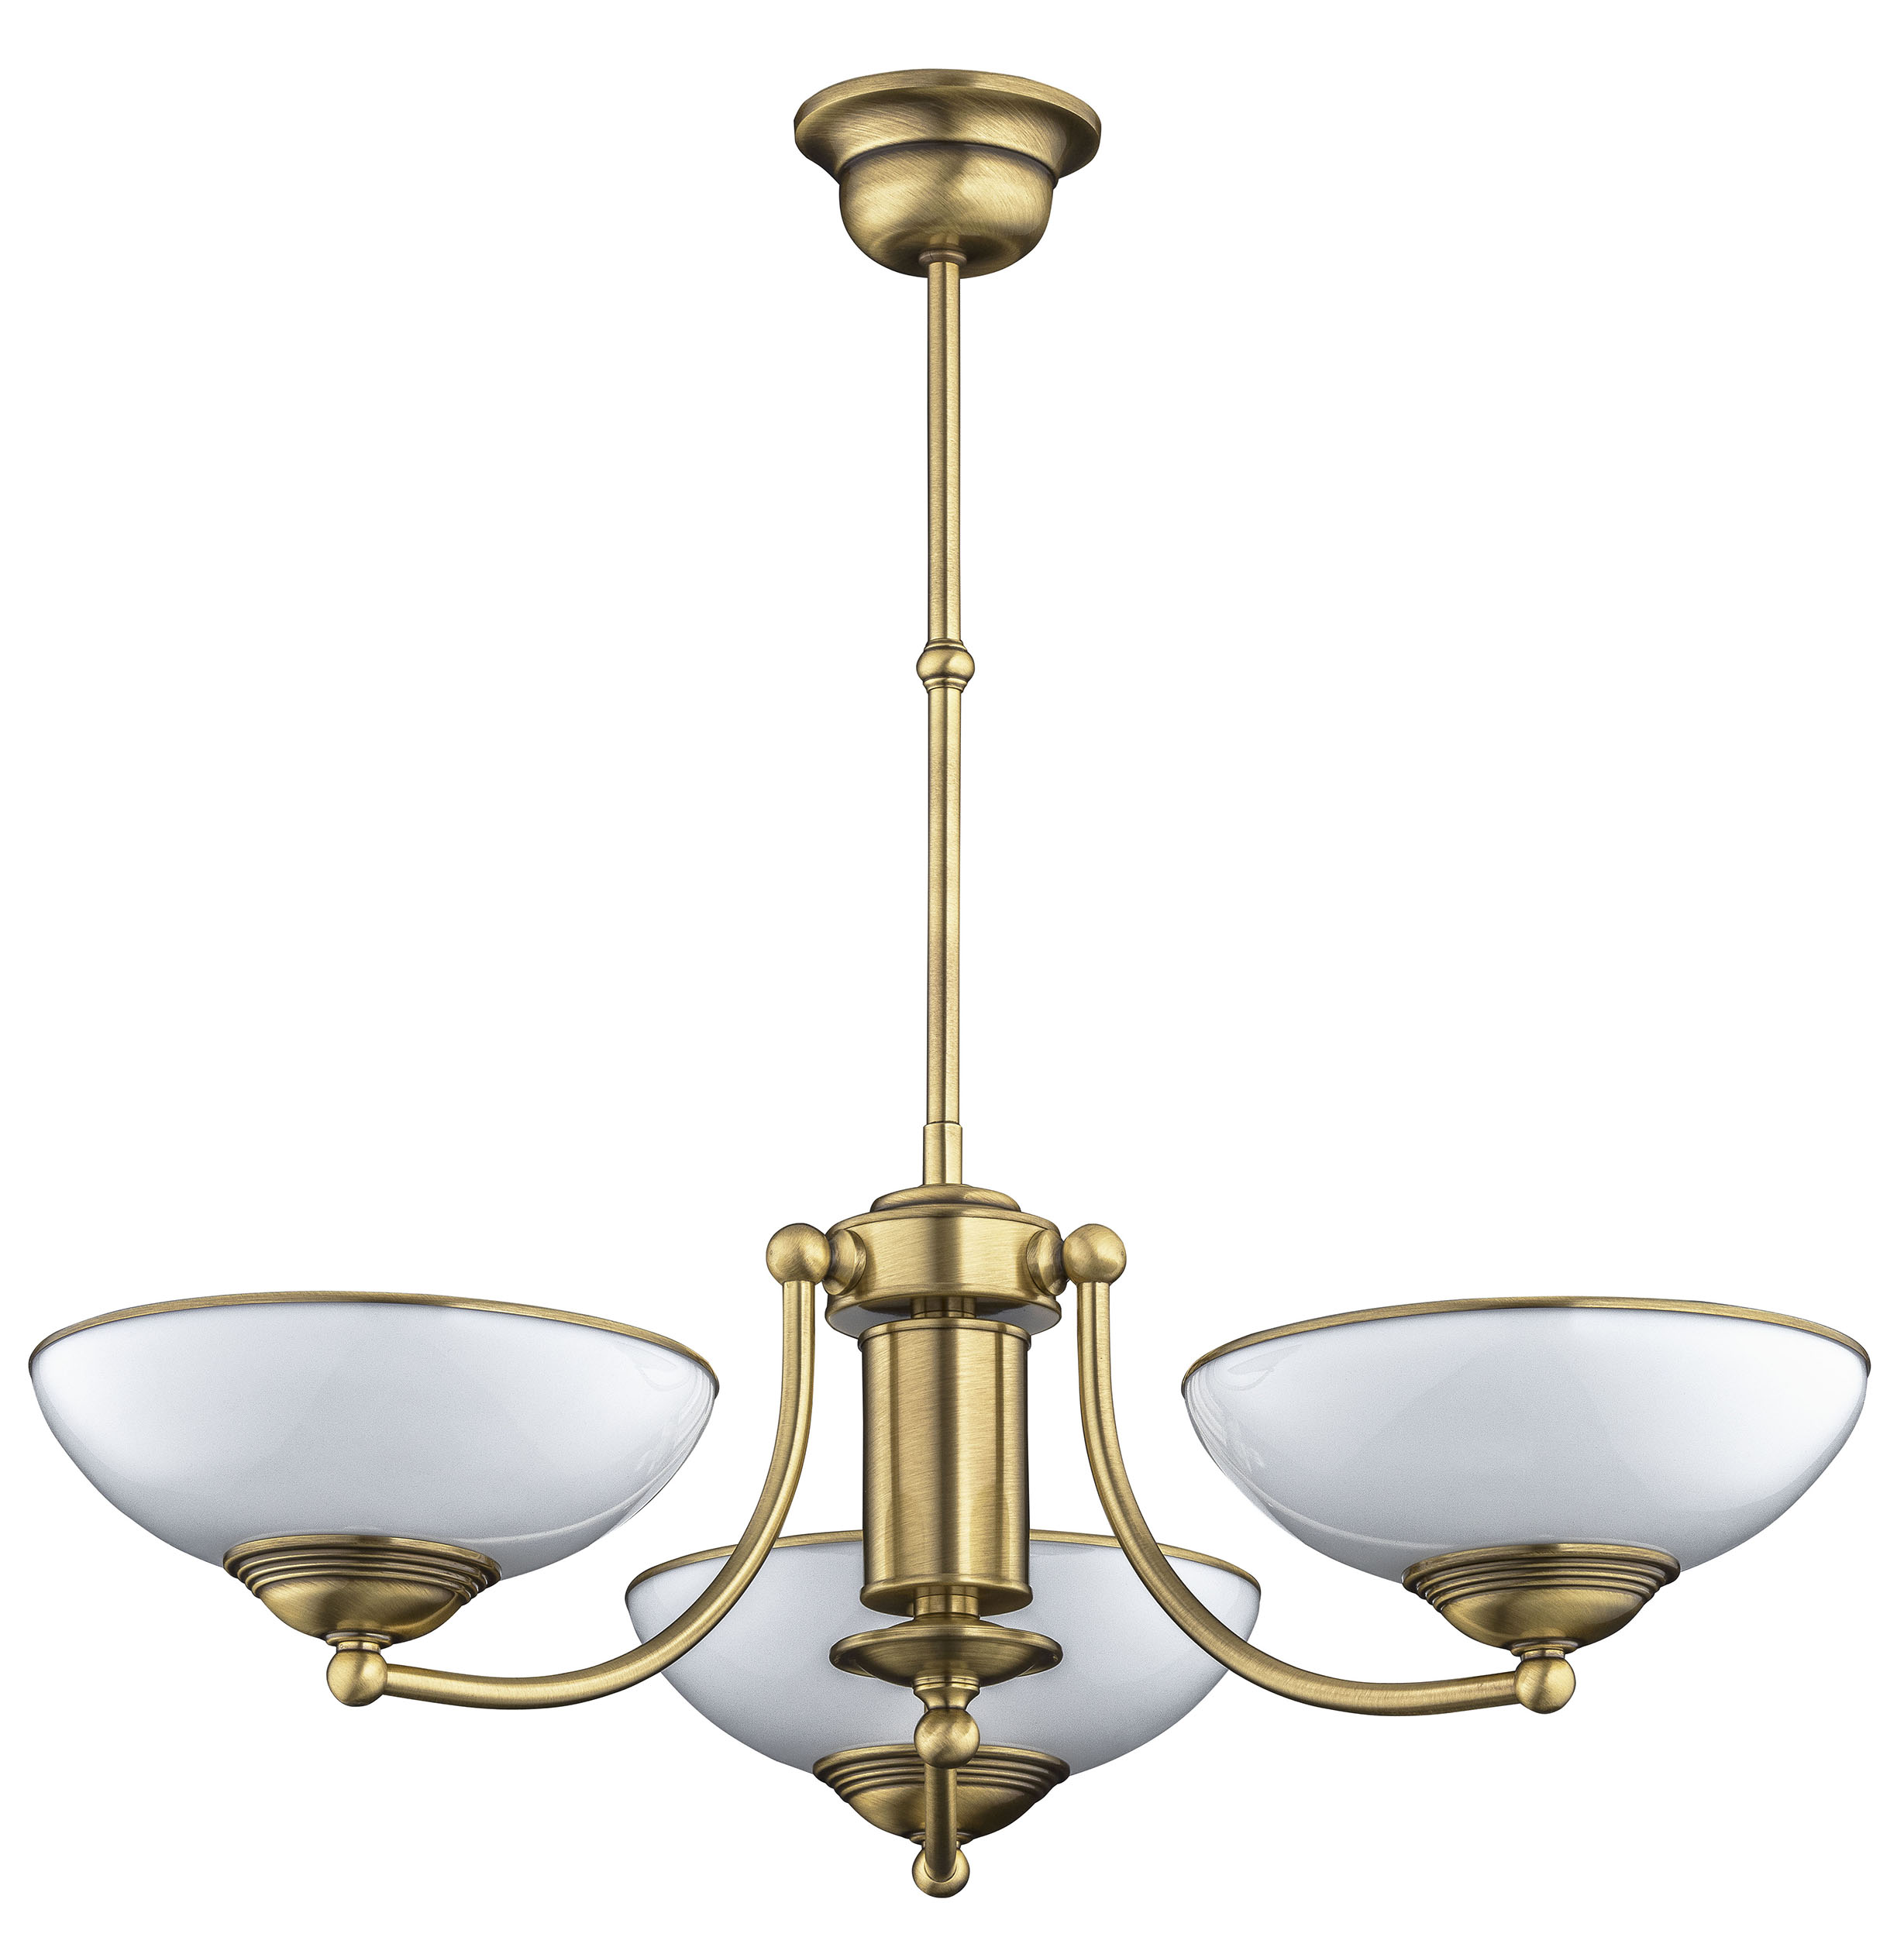 Lighting room BOLT 3 light ceiling chandelier lighting in gold, grey shades